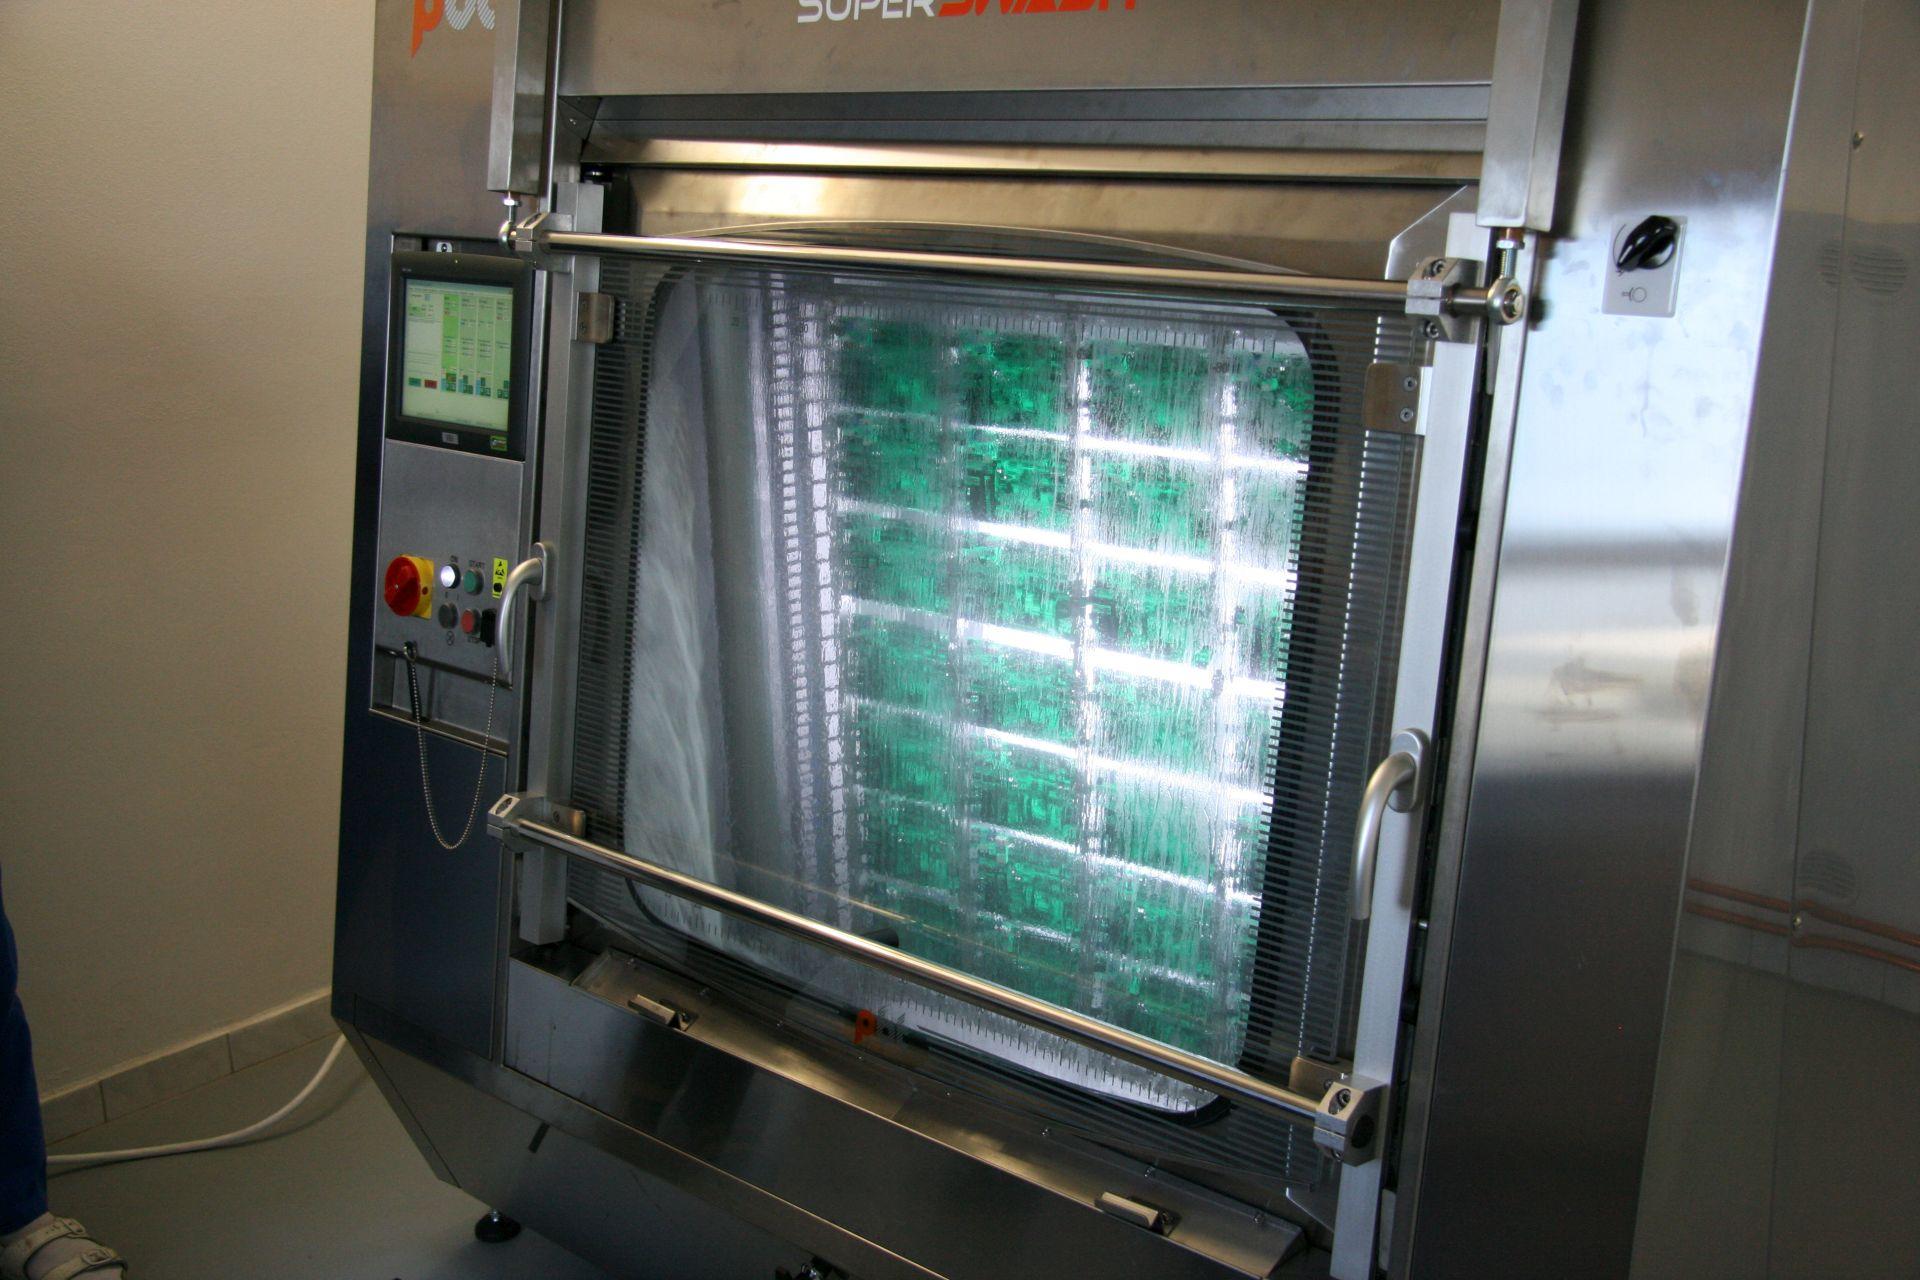 PCB Washer Super SWASH IIR+